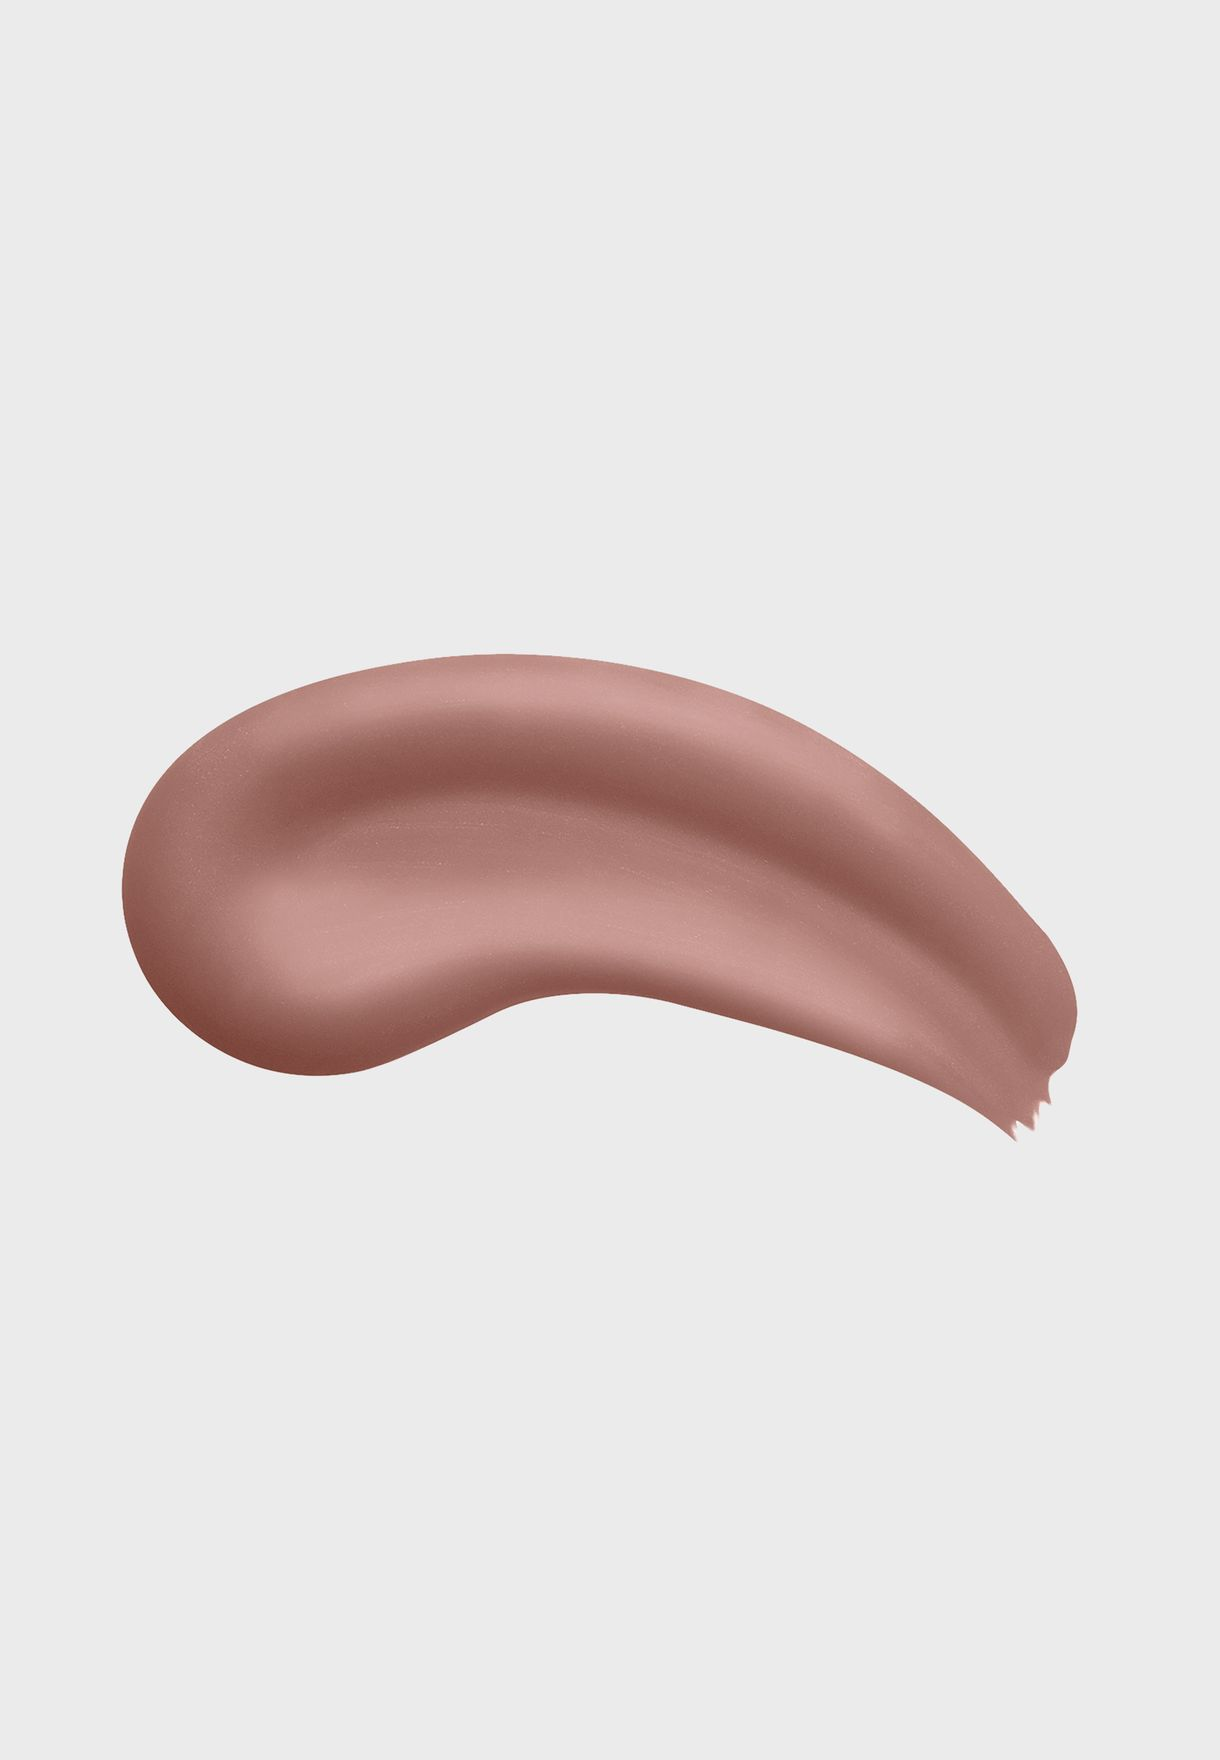 Dose of Cacoa Chocolates Lipstick 848